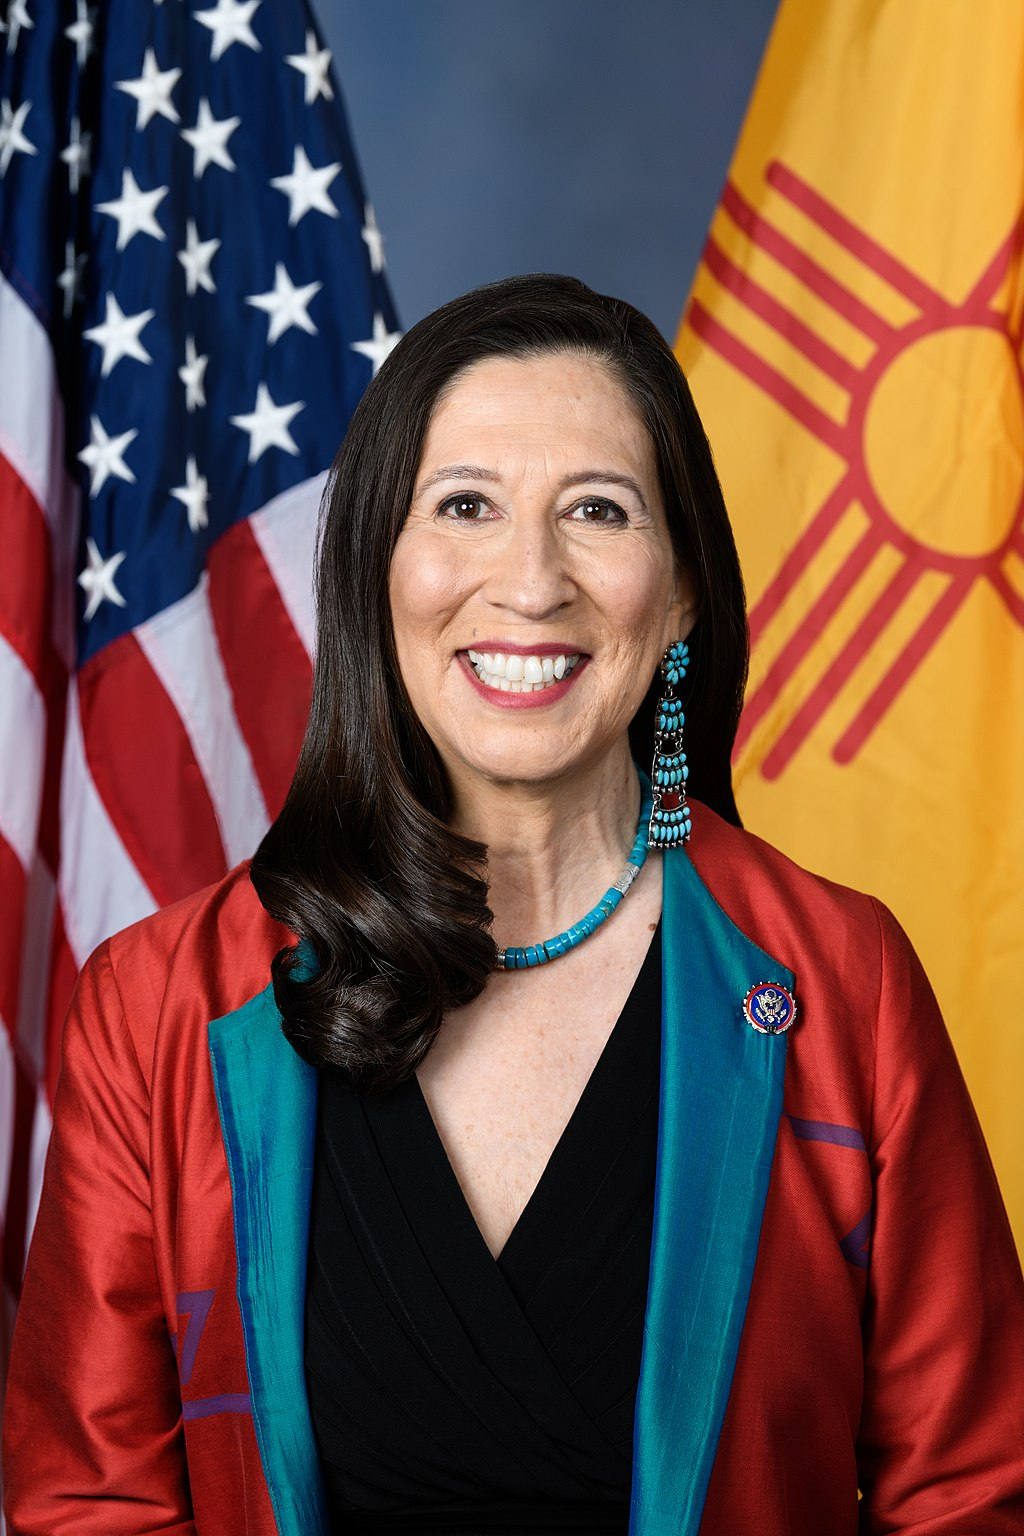 Congressman Teresa Leger Fernandez